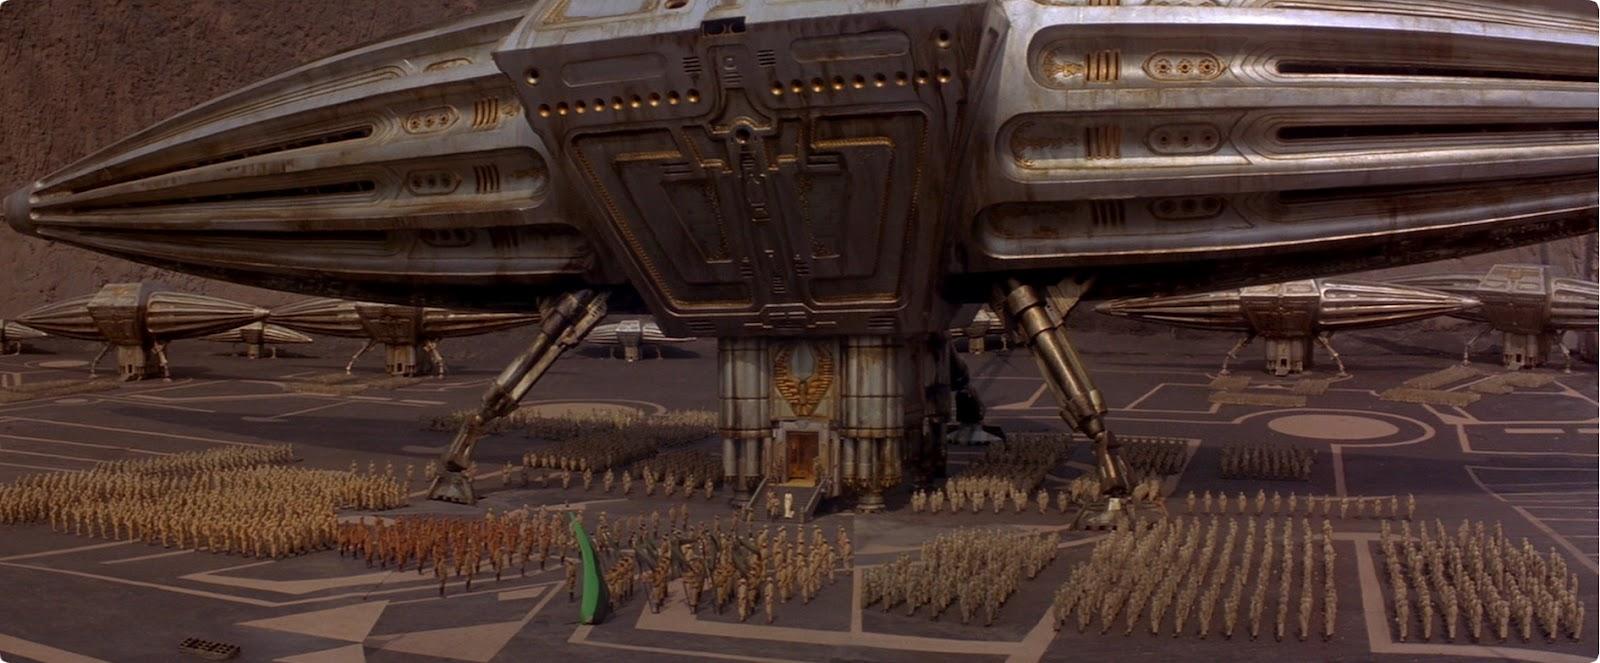 dune movie spaceship david lynch 1984